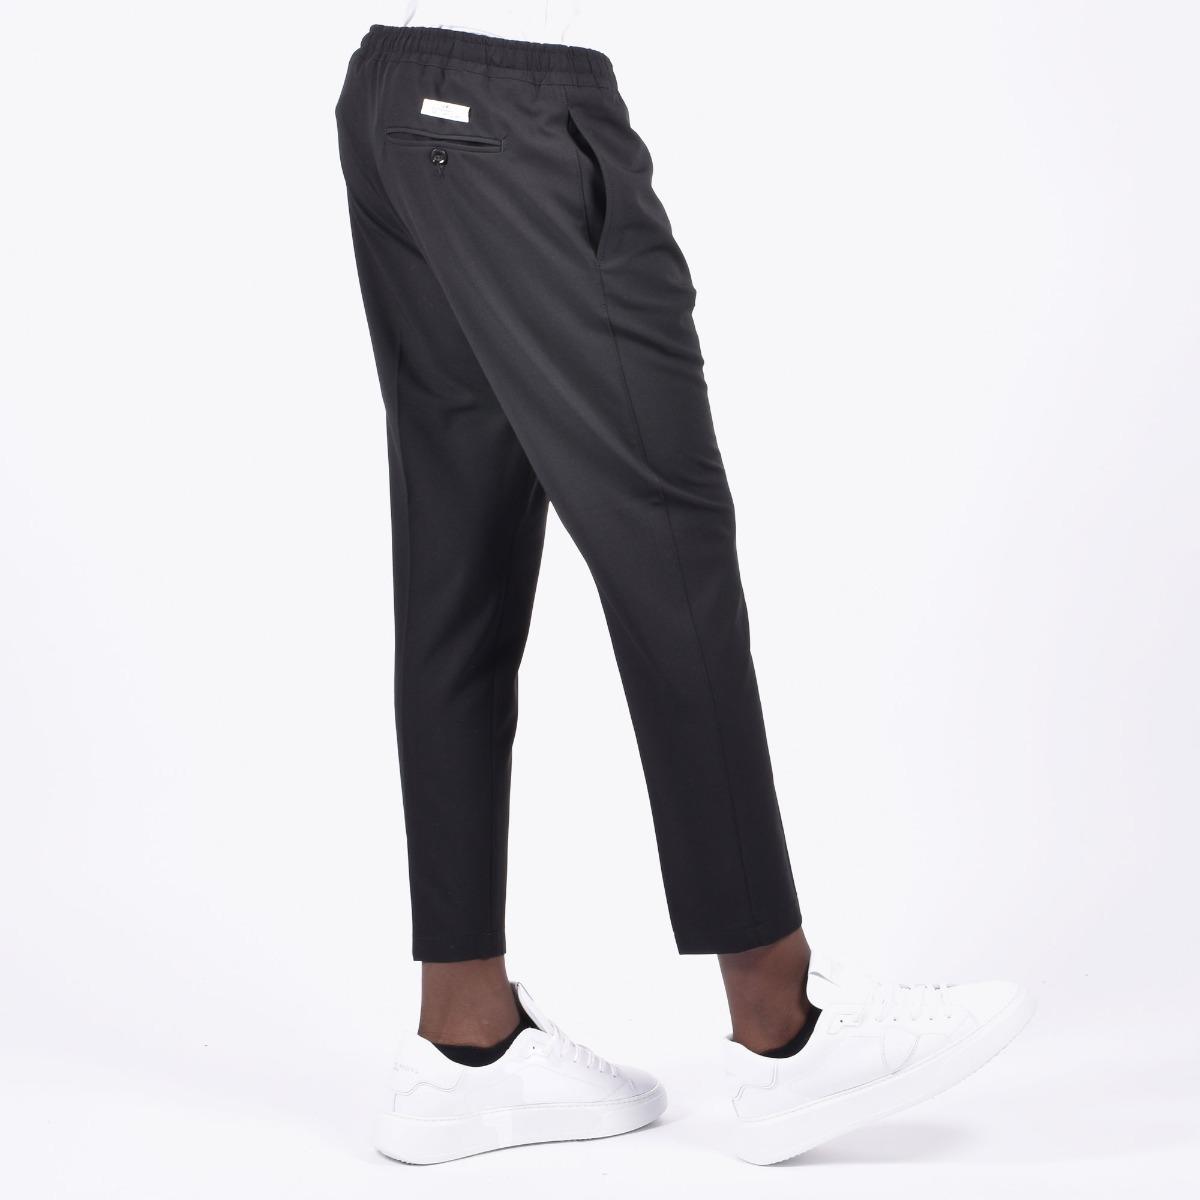 Pantalone vita elasticizzata - Nero